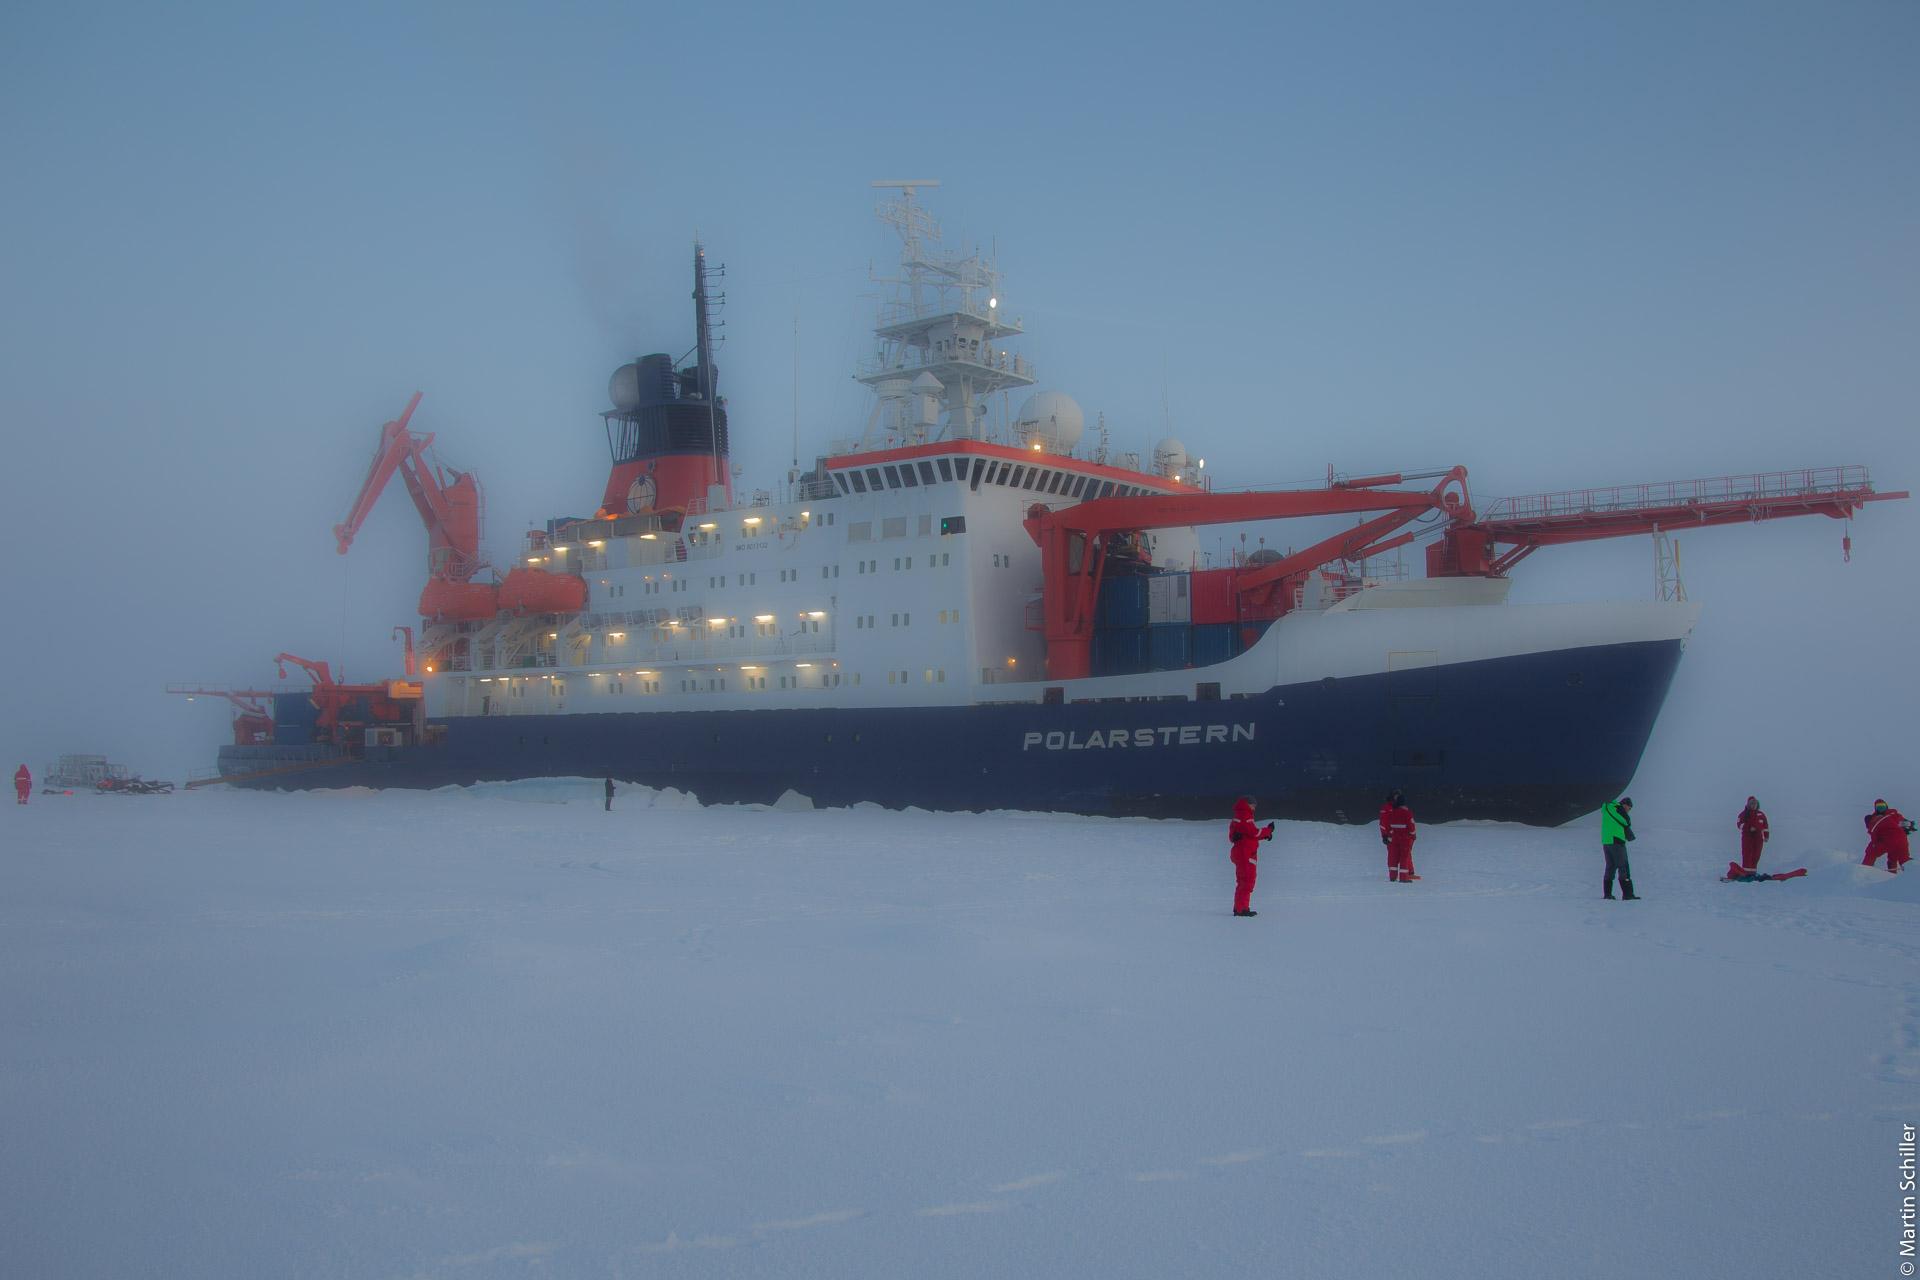 Polarstern steckt im Eis